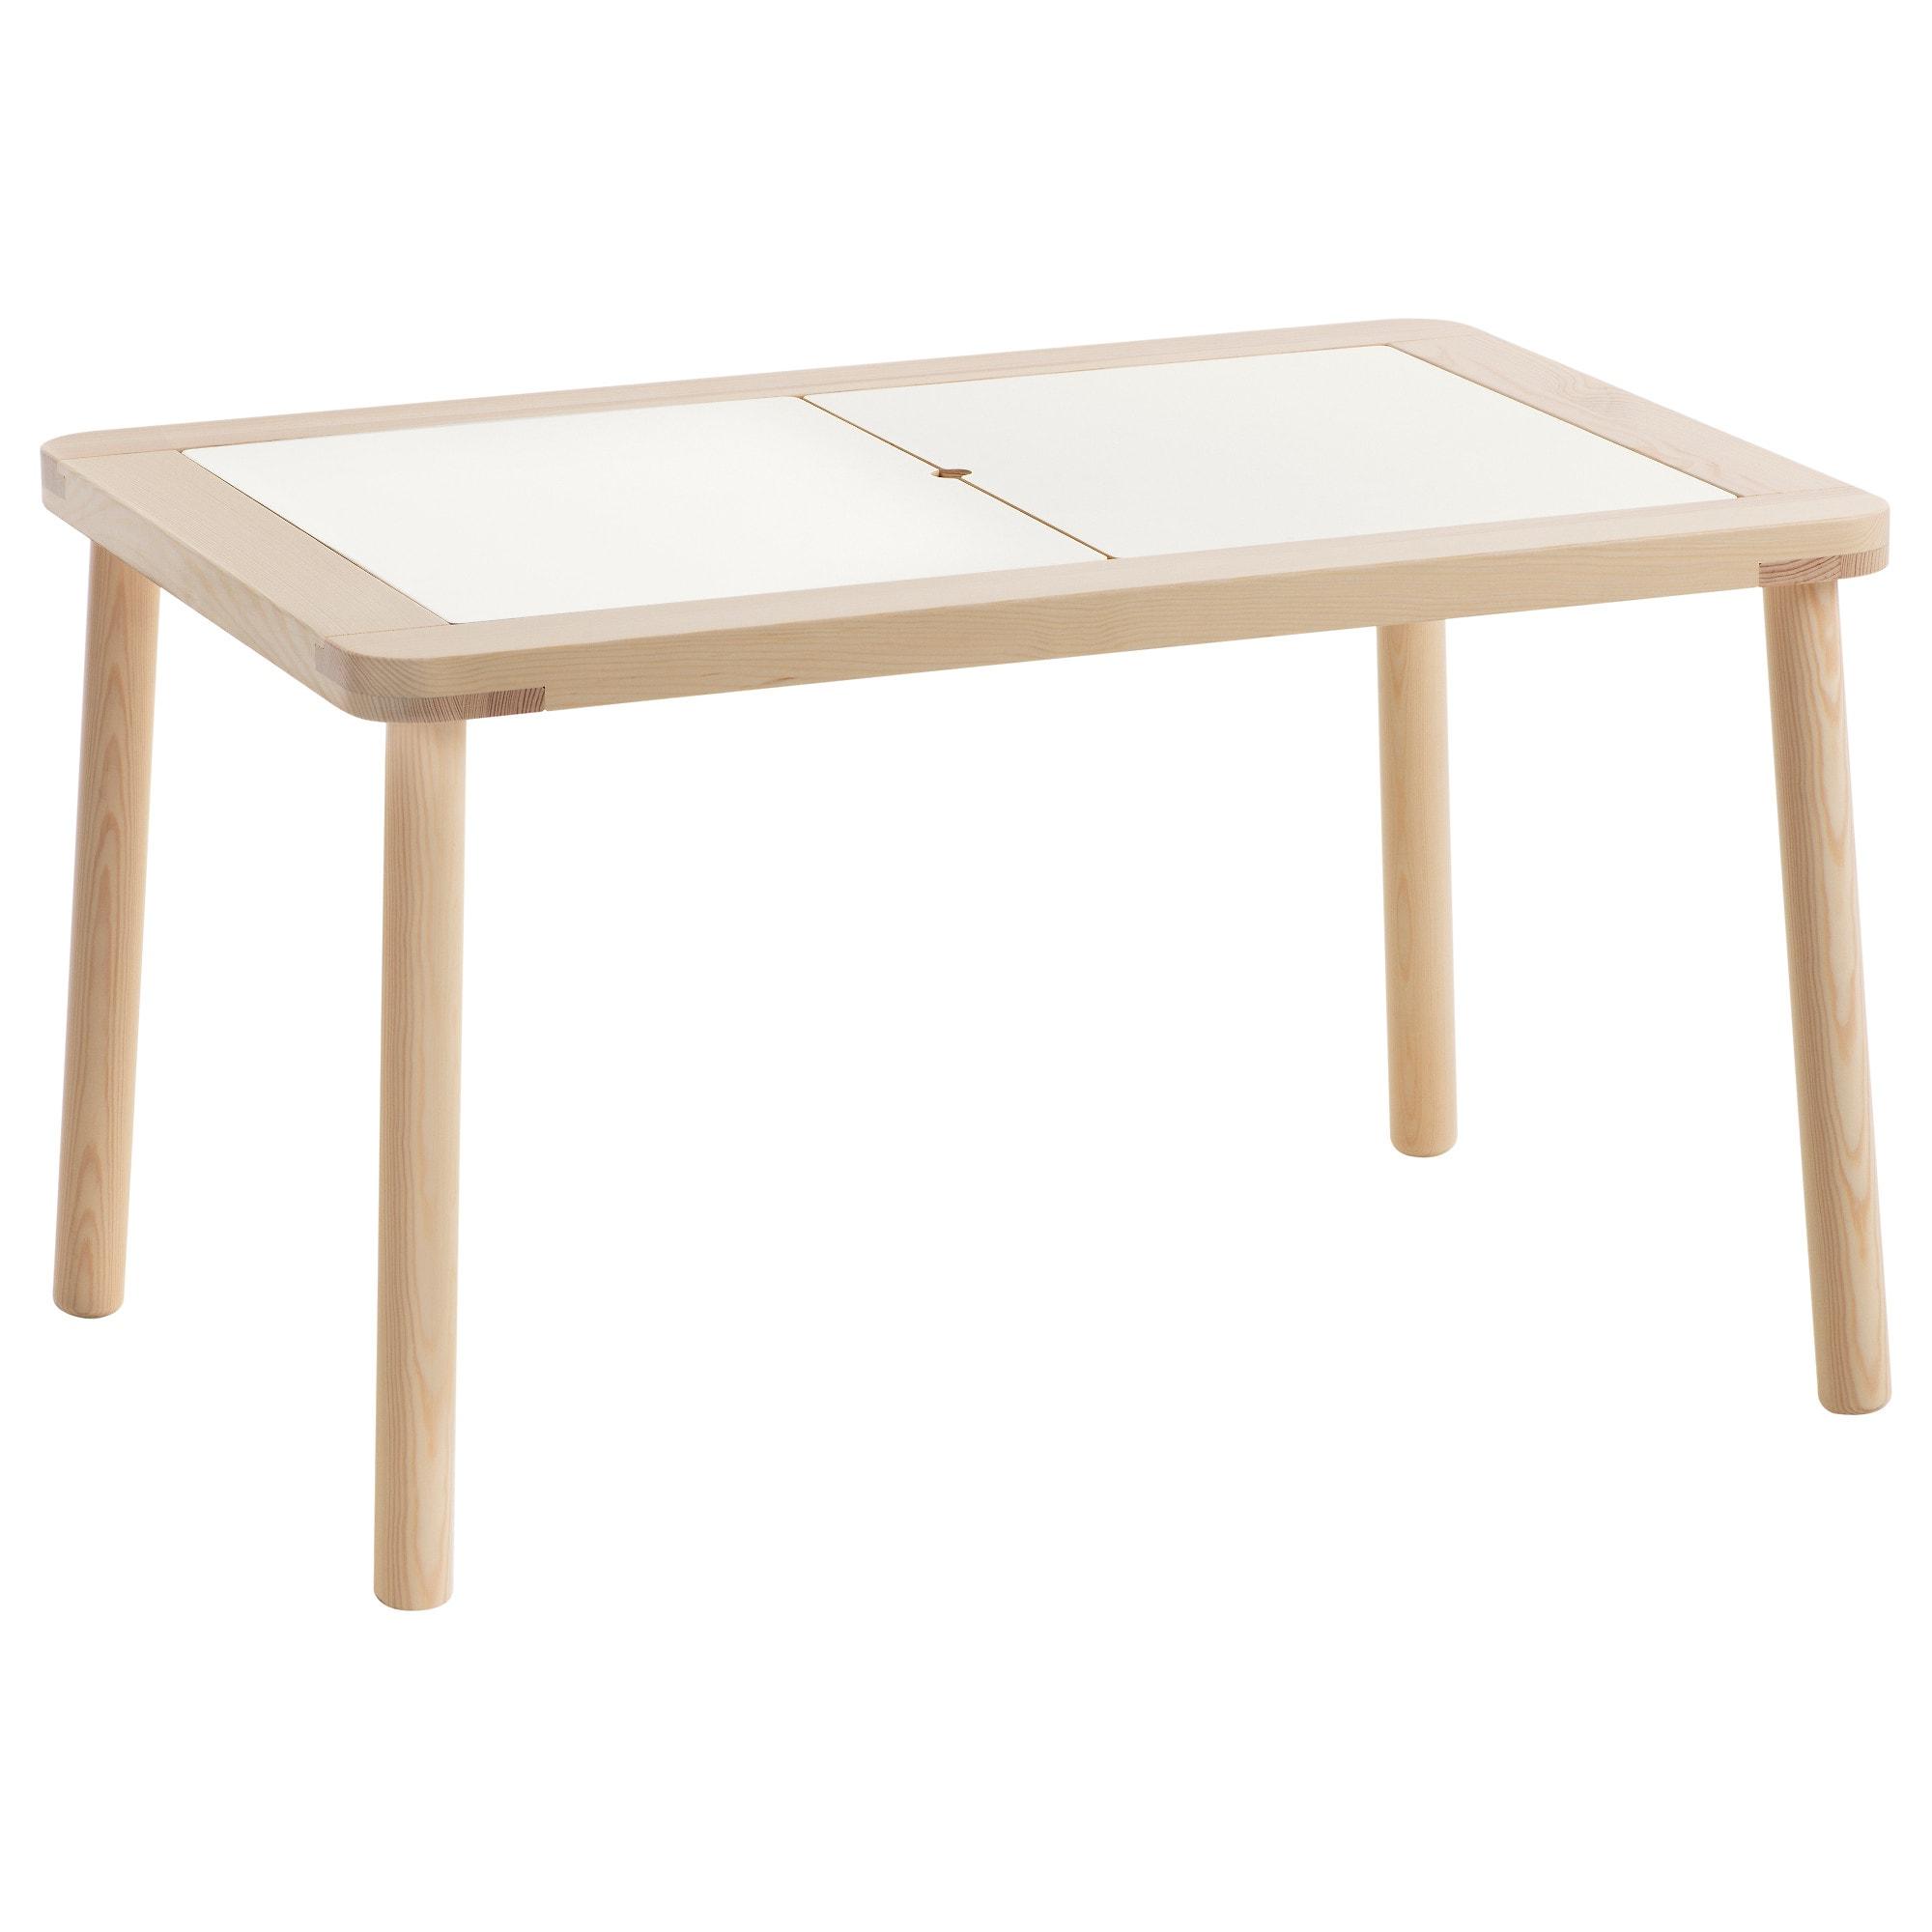 Ikea Mesa Infantil Mndw Flisat Mesa Para Nià Os 83 X 58 Cm Ikea